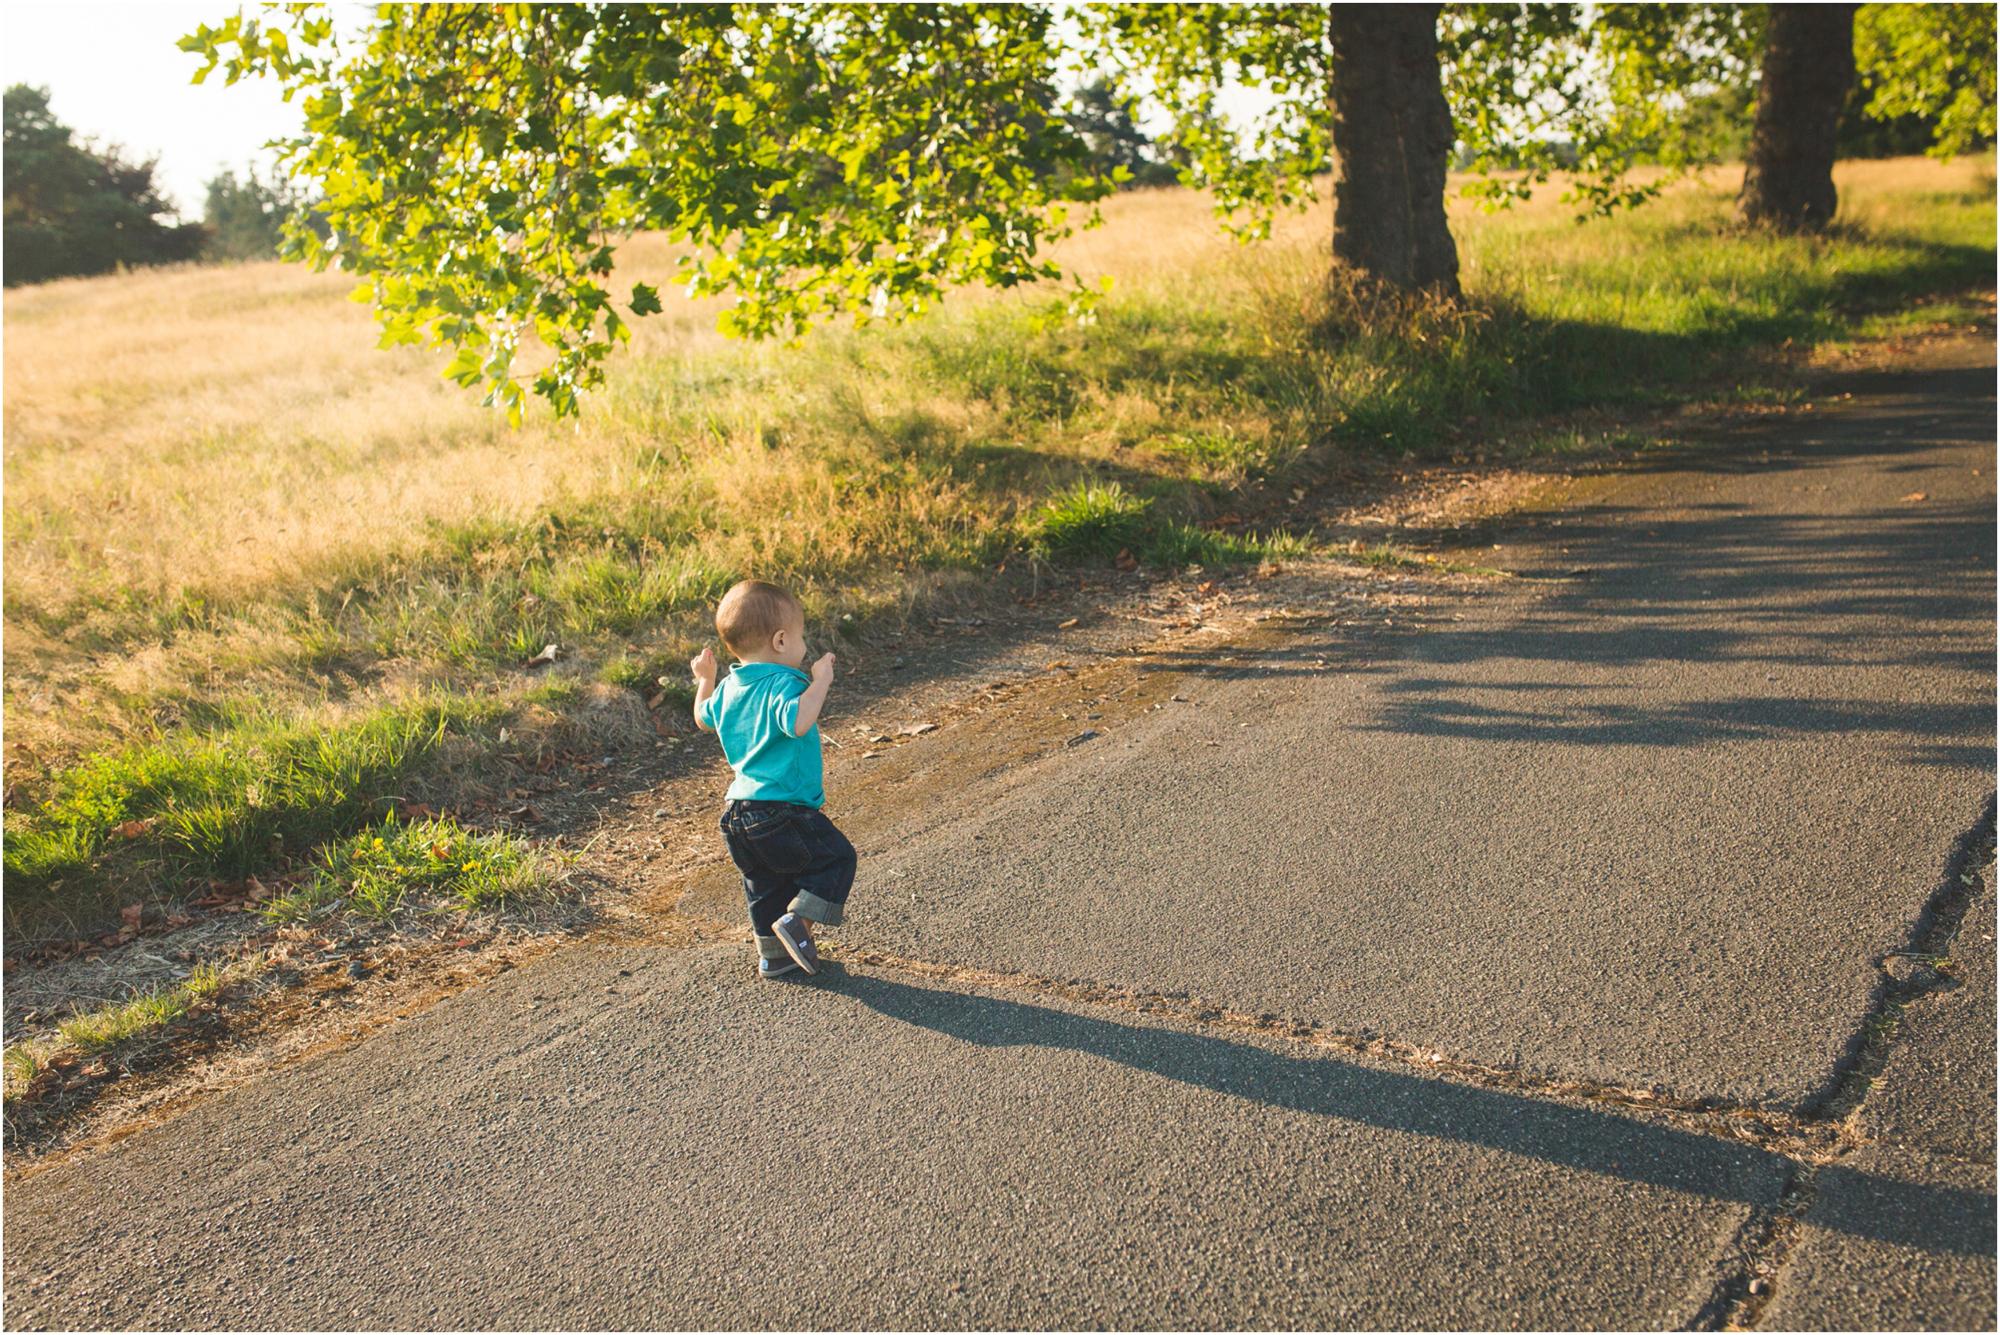 ashley vos photography seattle tacoma area newborn photographer_0656.jpg